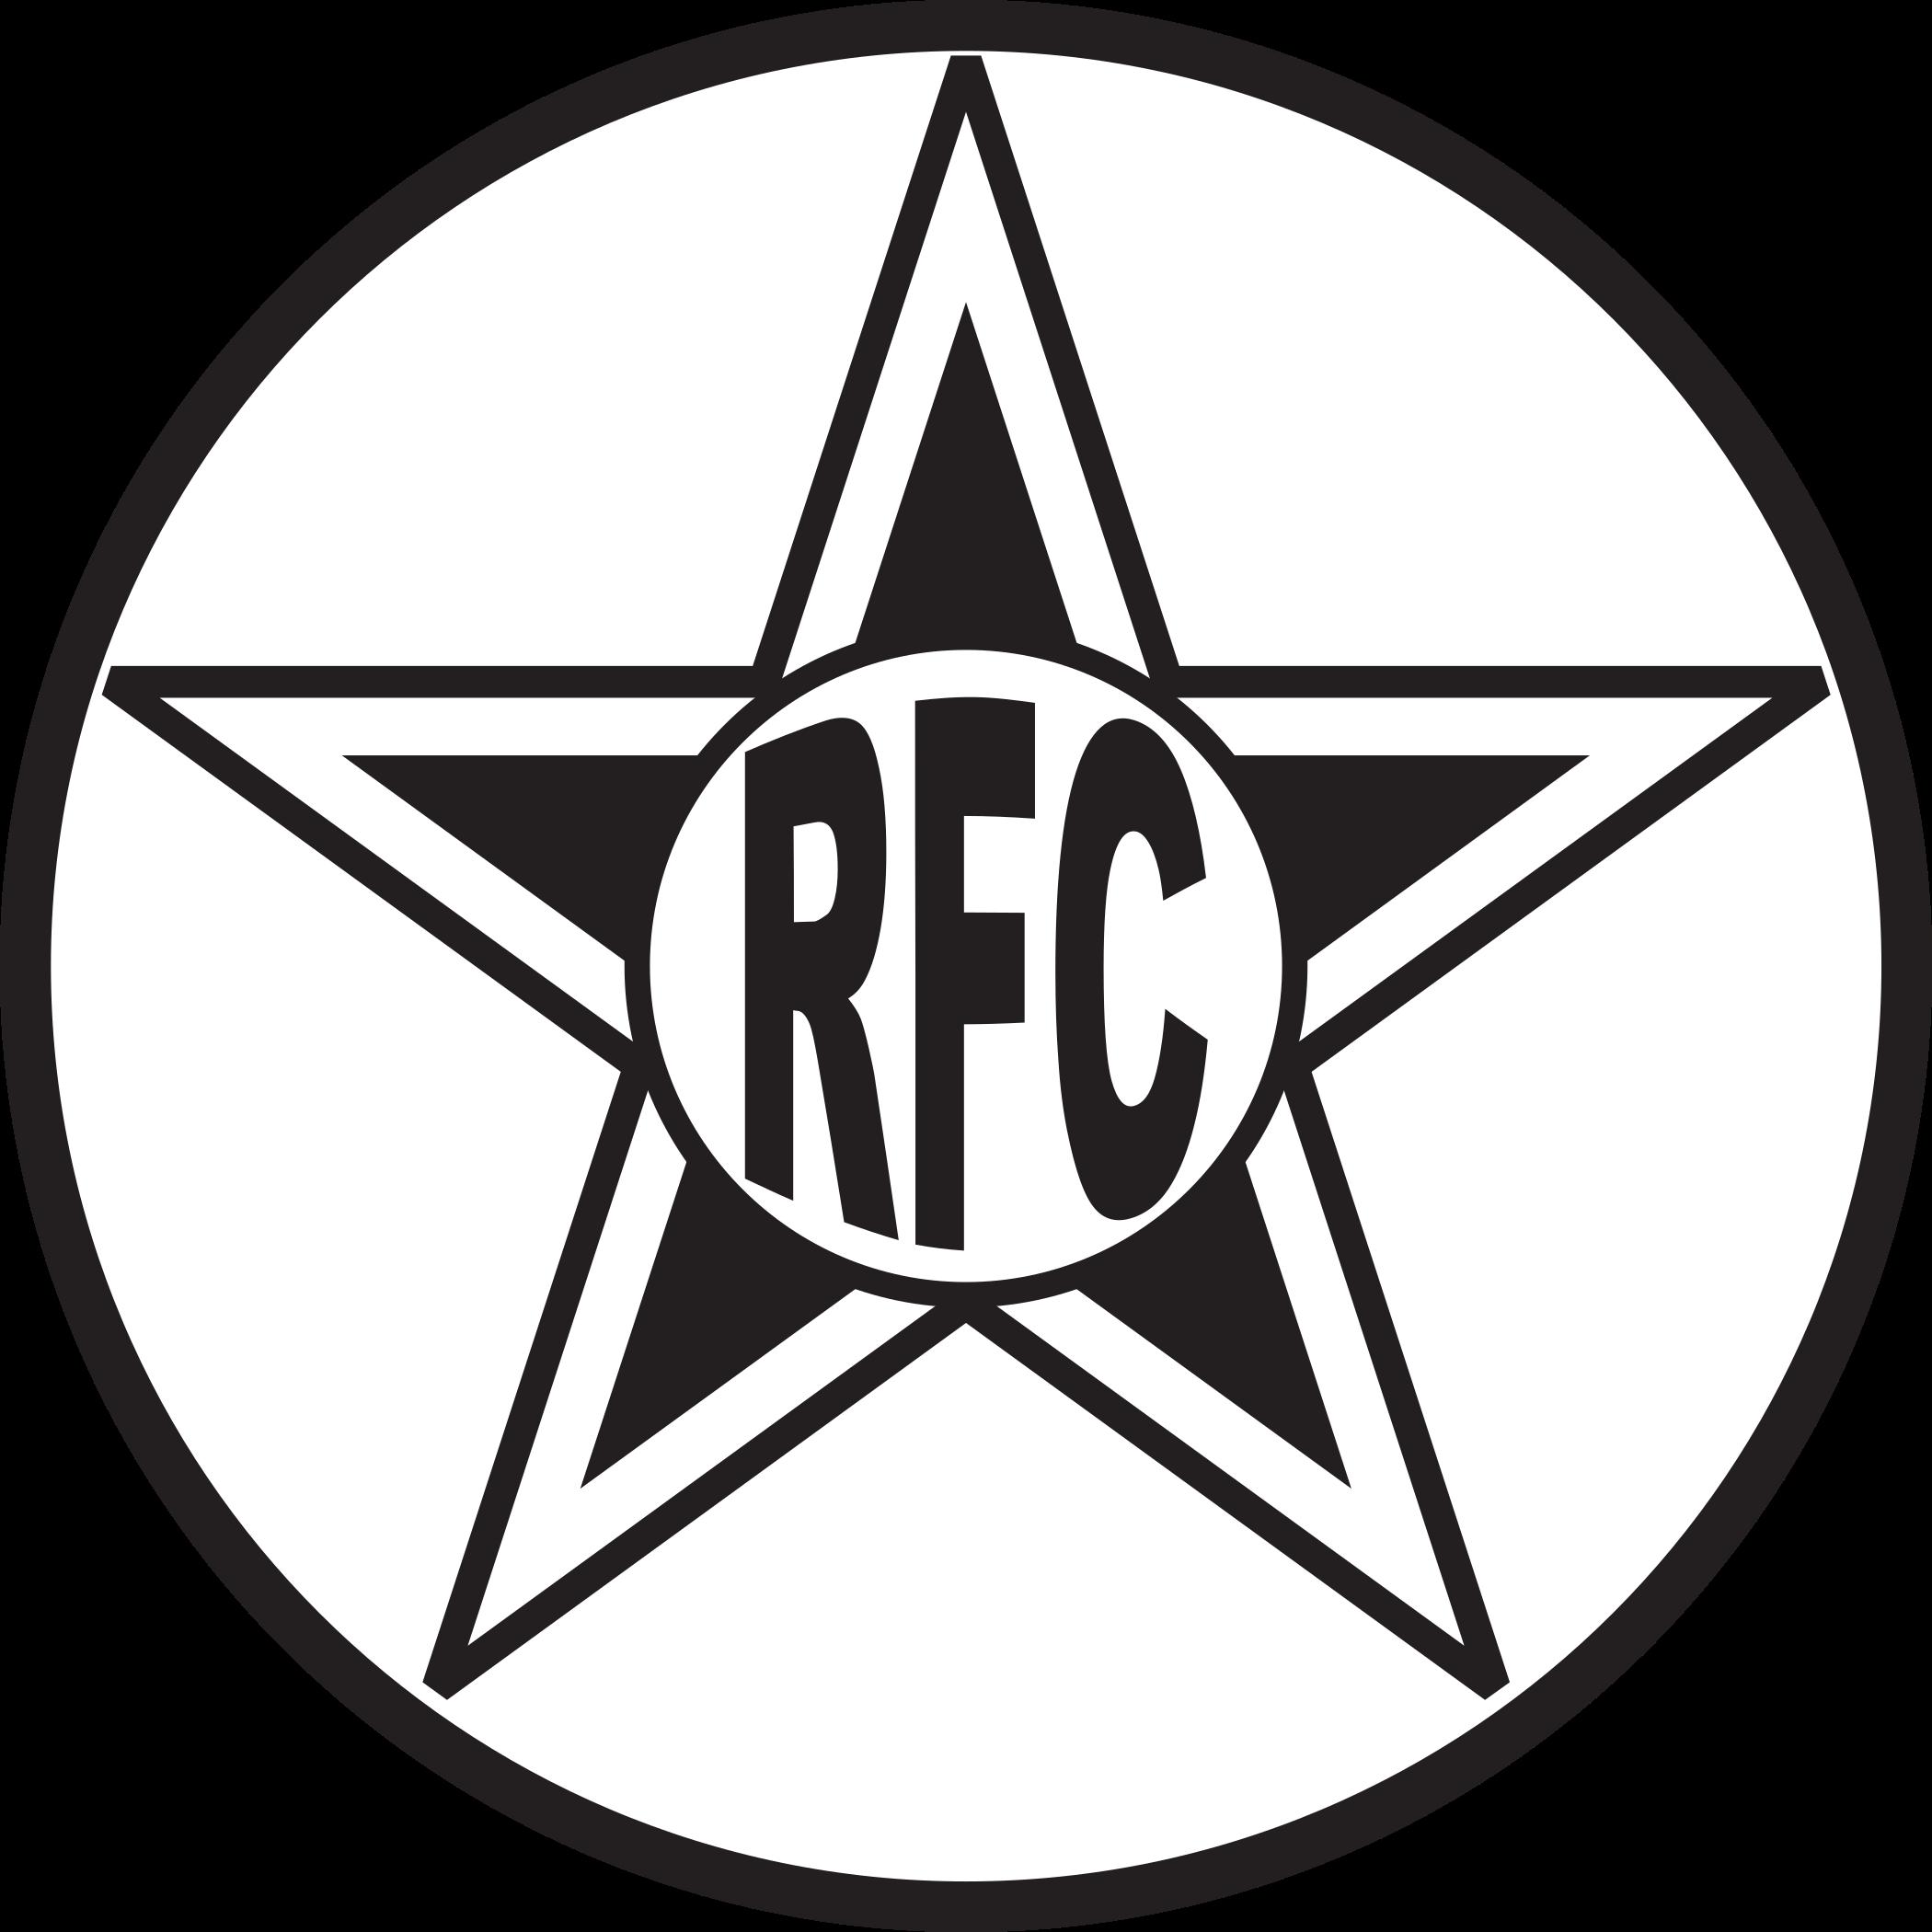 resende fc logo escudo 1 - Resende Logo - Resende Futebol Clube Escudo